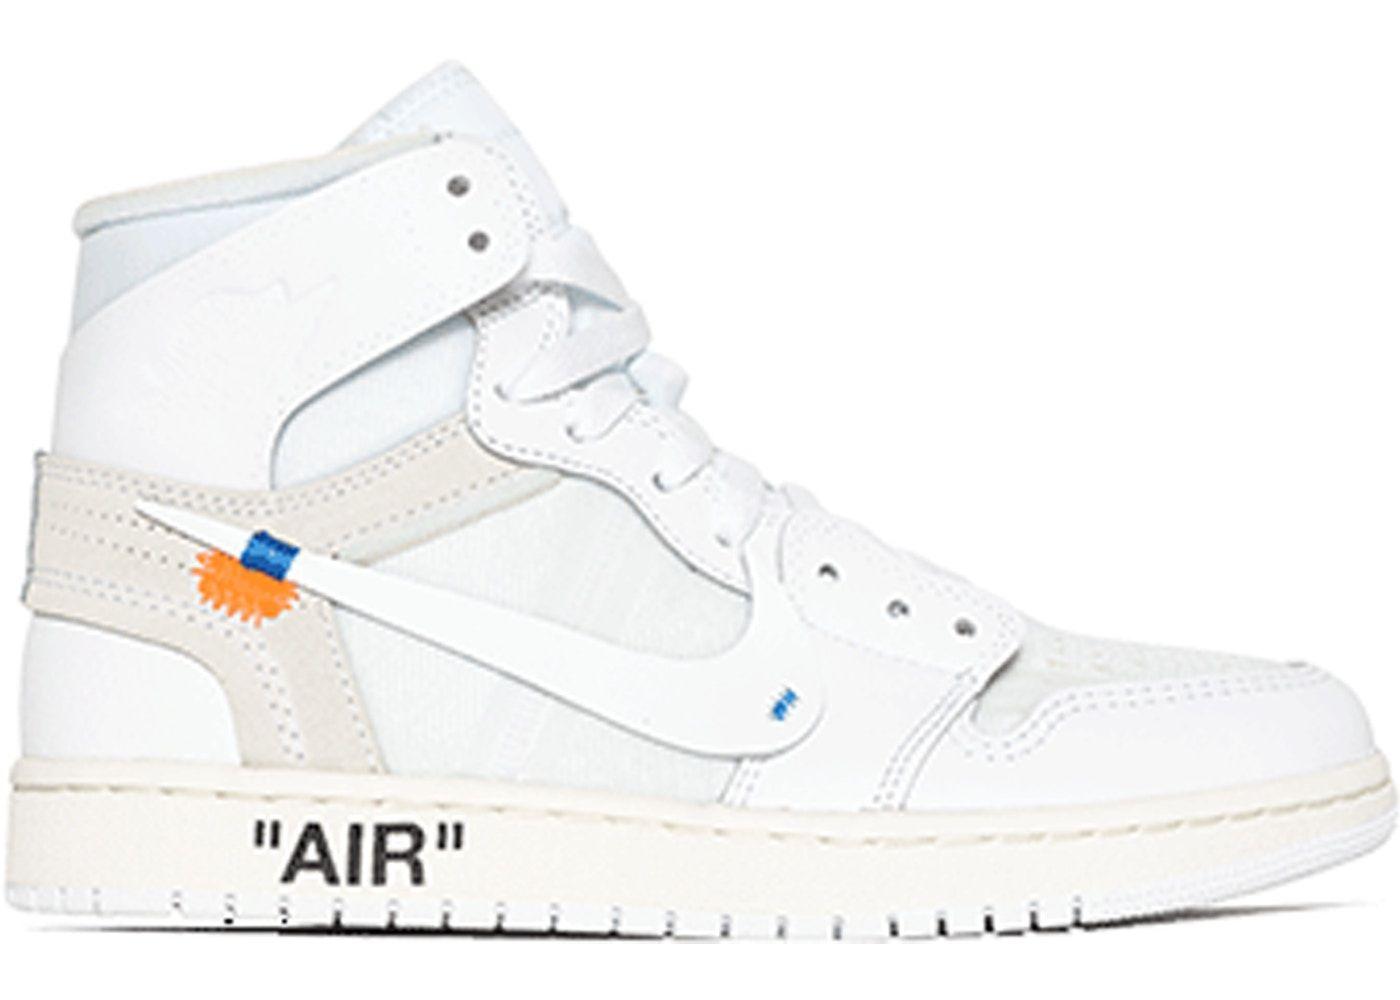 Nike air shoes, Jordan 1 retro high